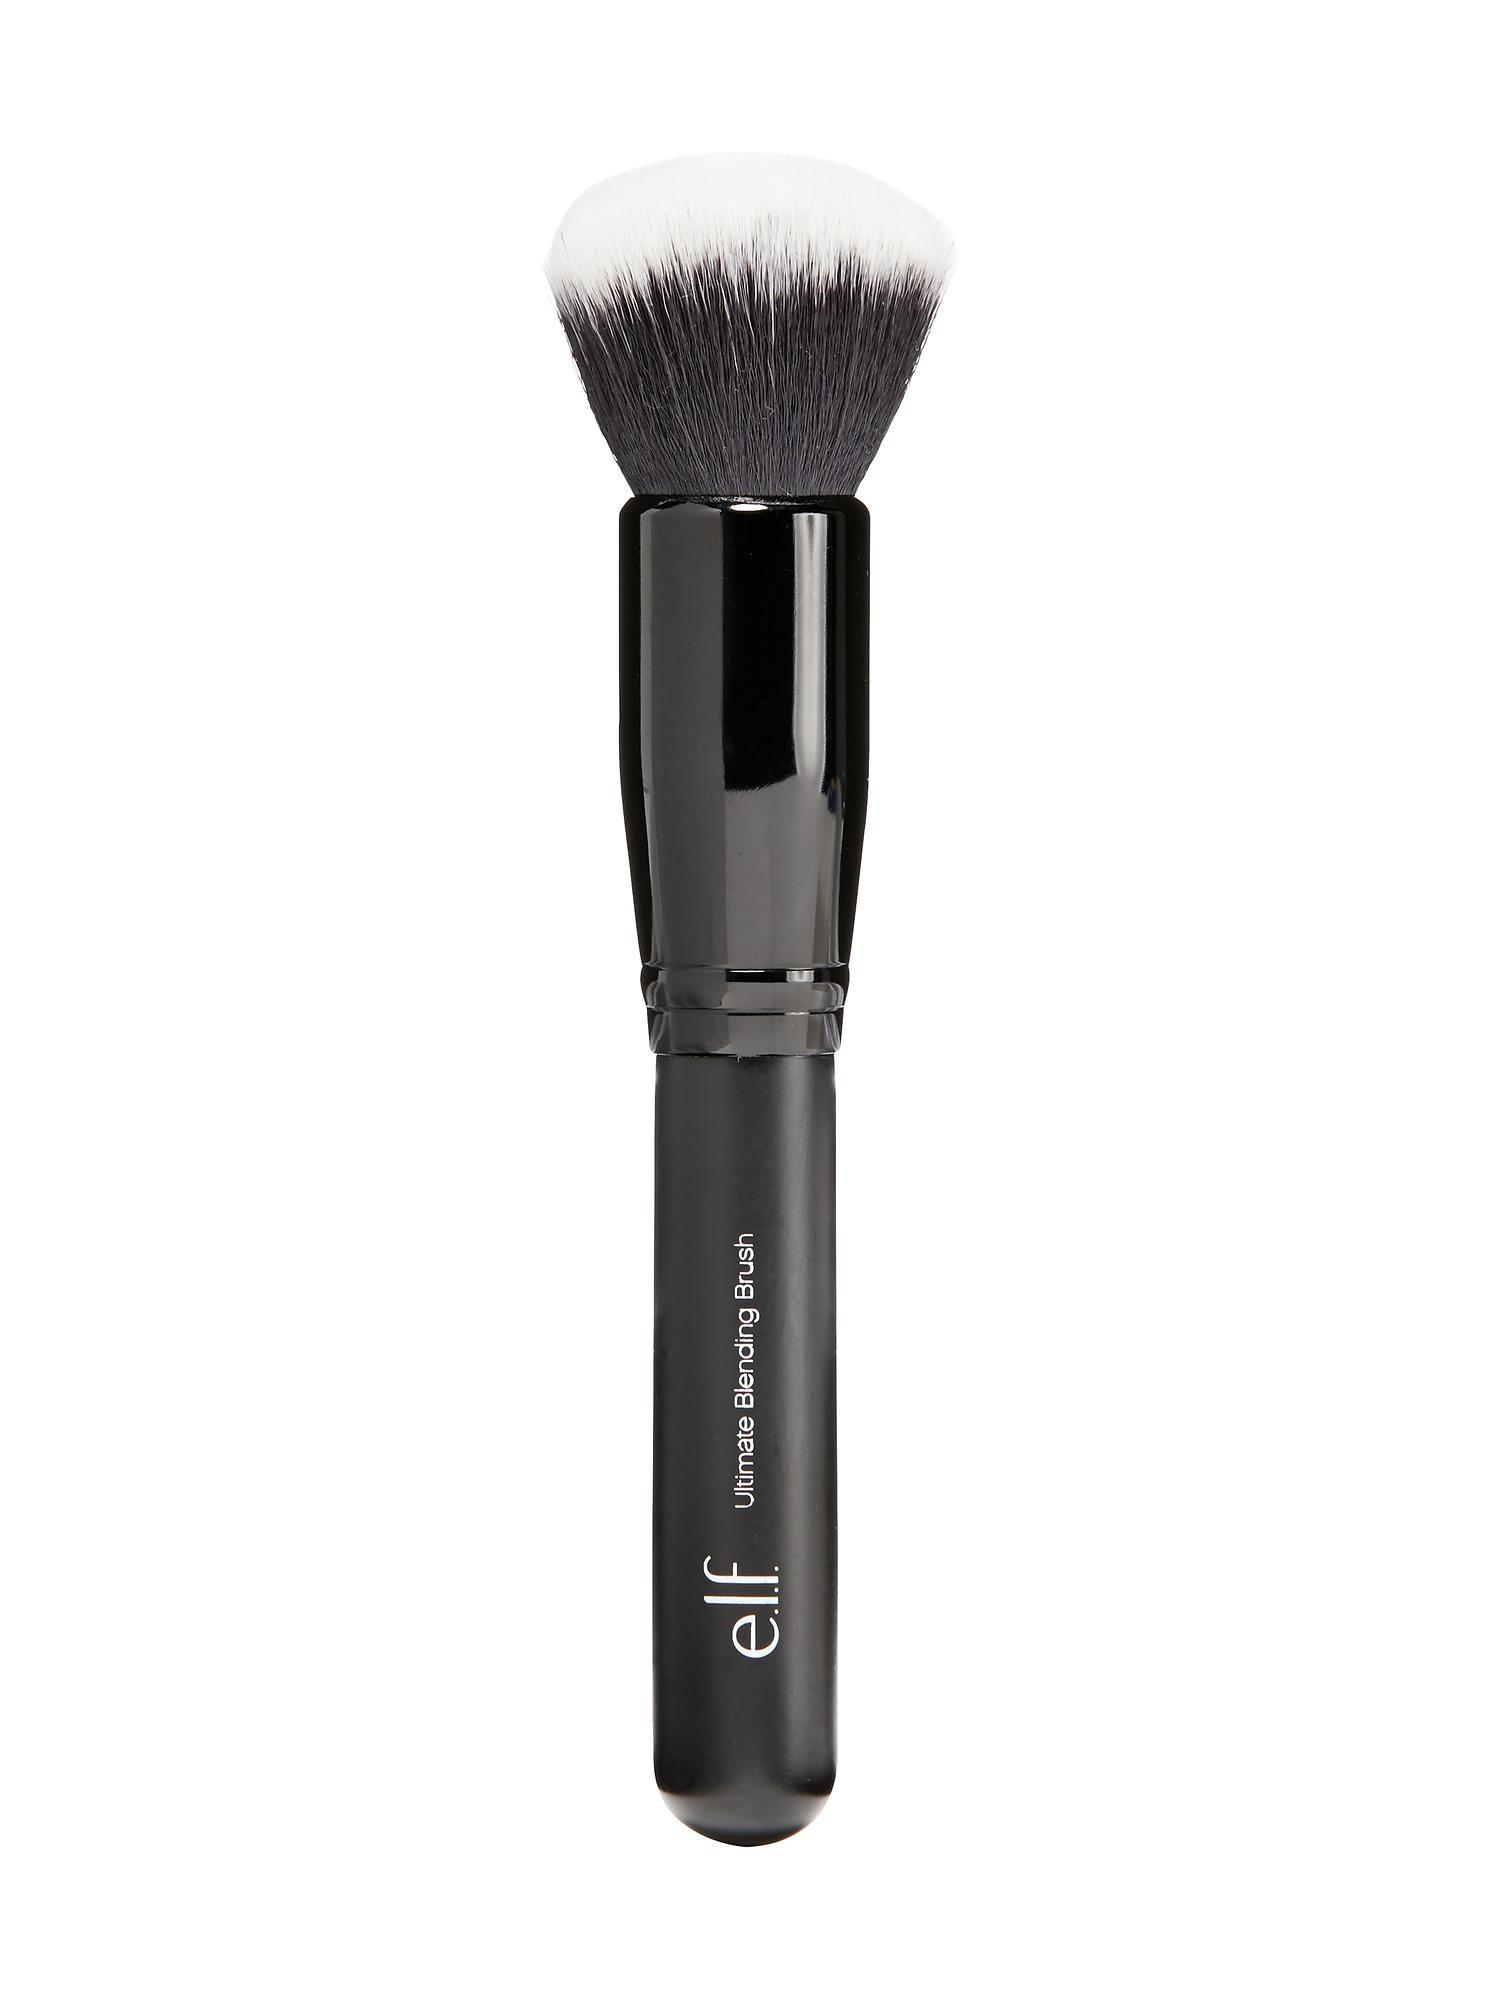 Elf Studio Ultimate Kabuki Brush Black Cosmetics